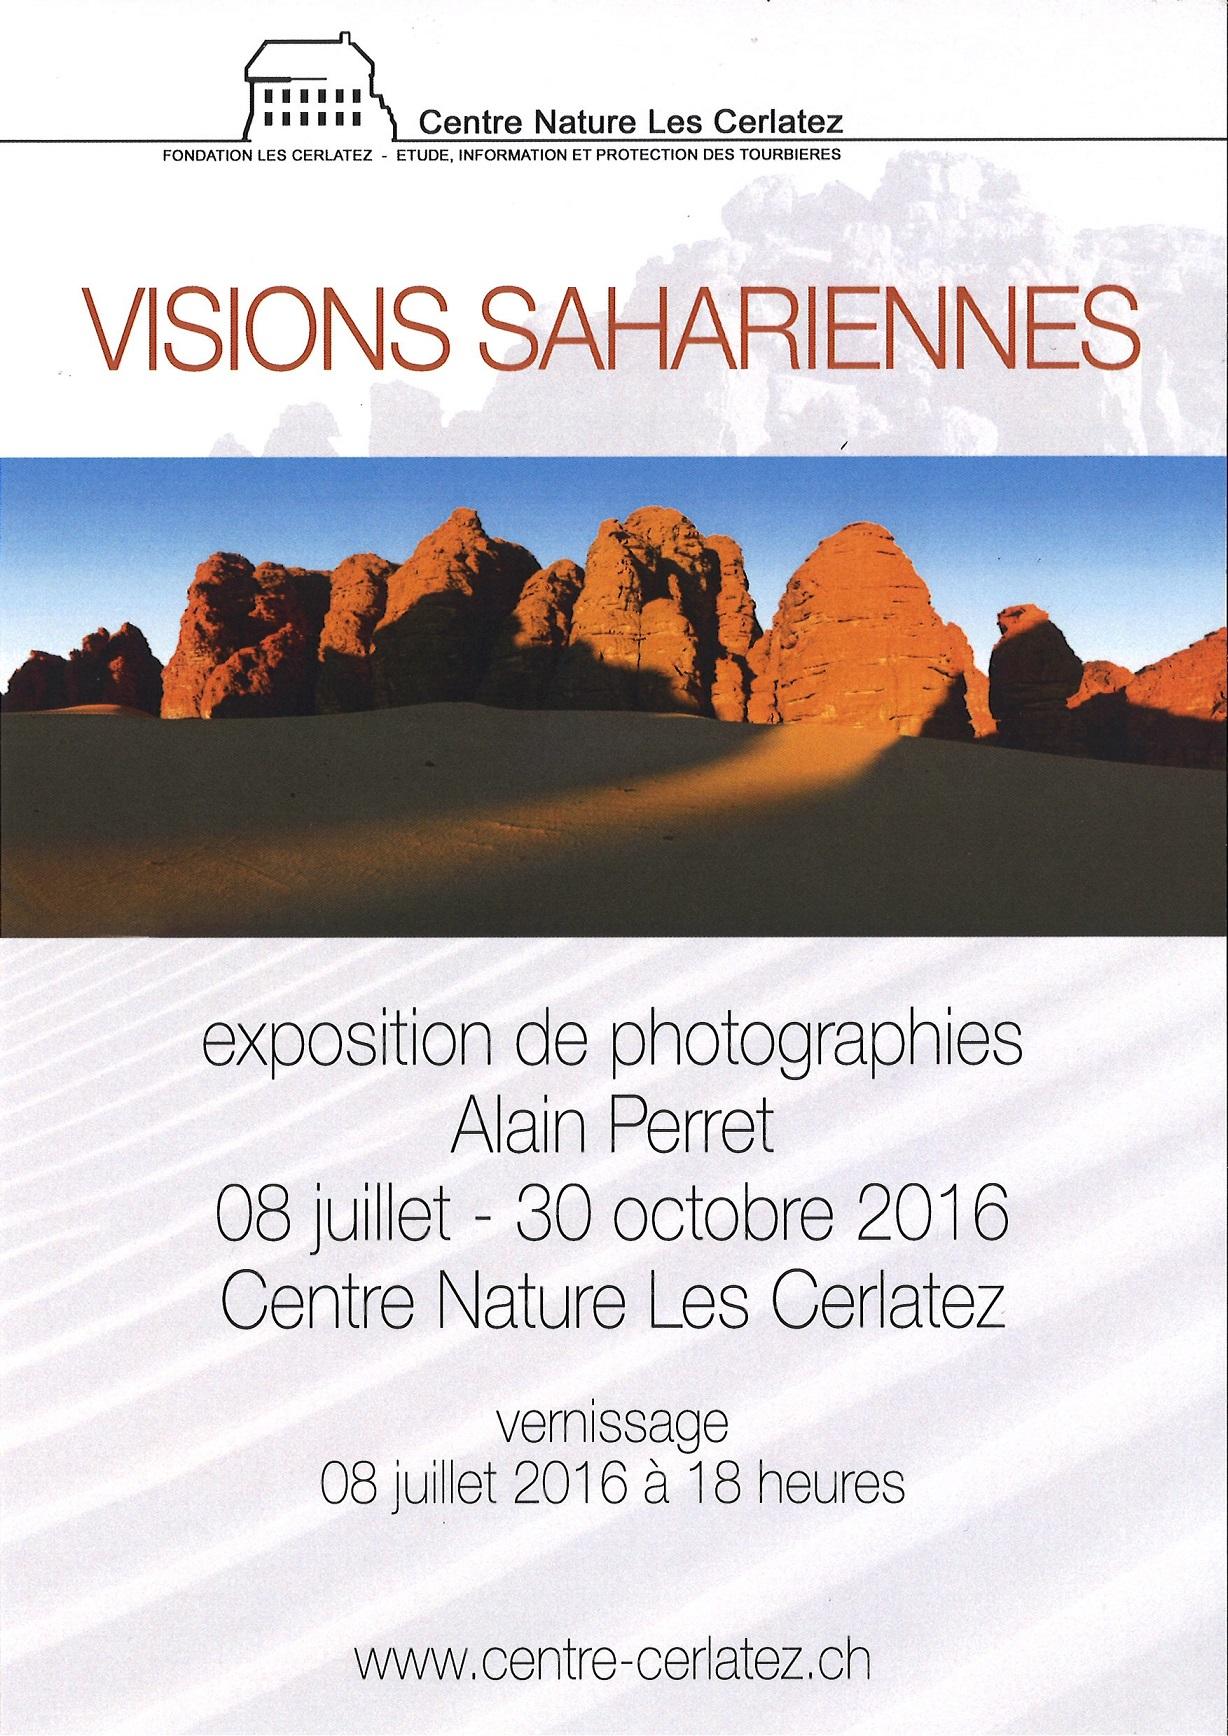 Expo Alain Perret_Visions sahariennes